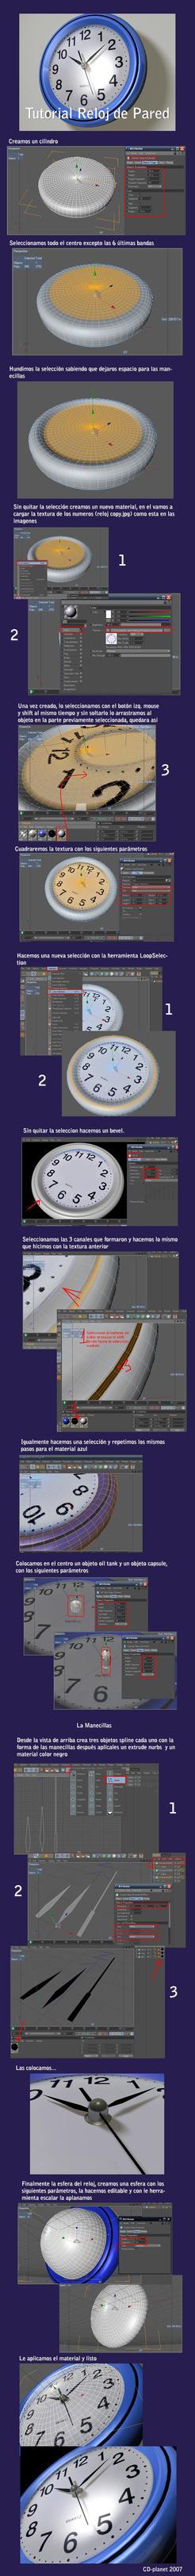 Tutorial Reloj de Pared by cd-planet